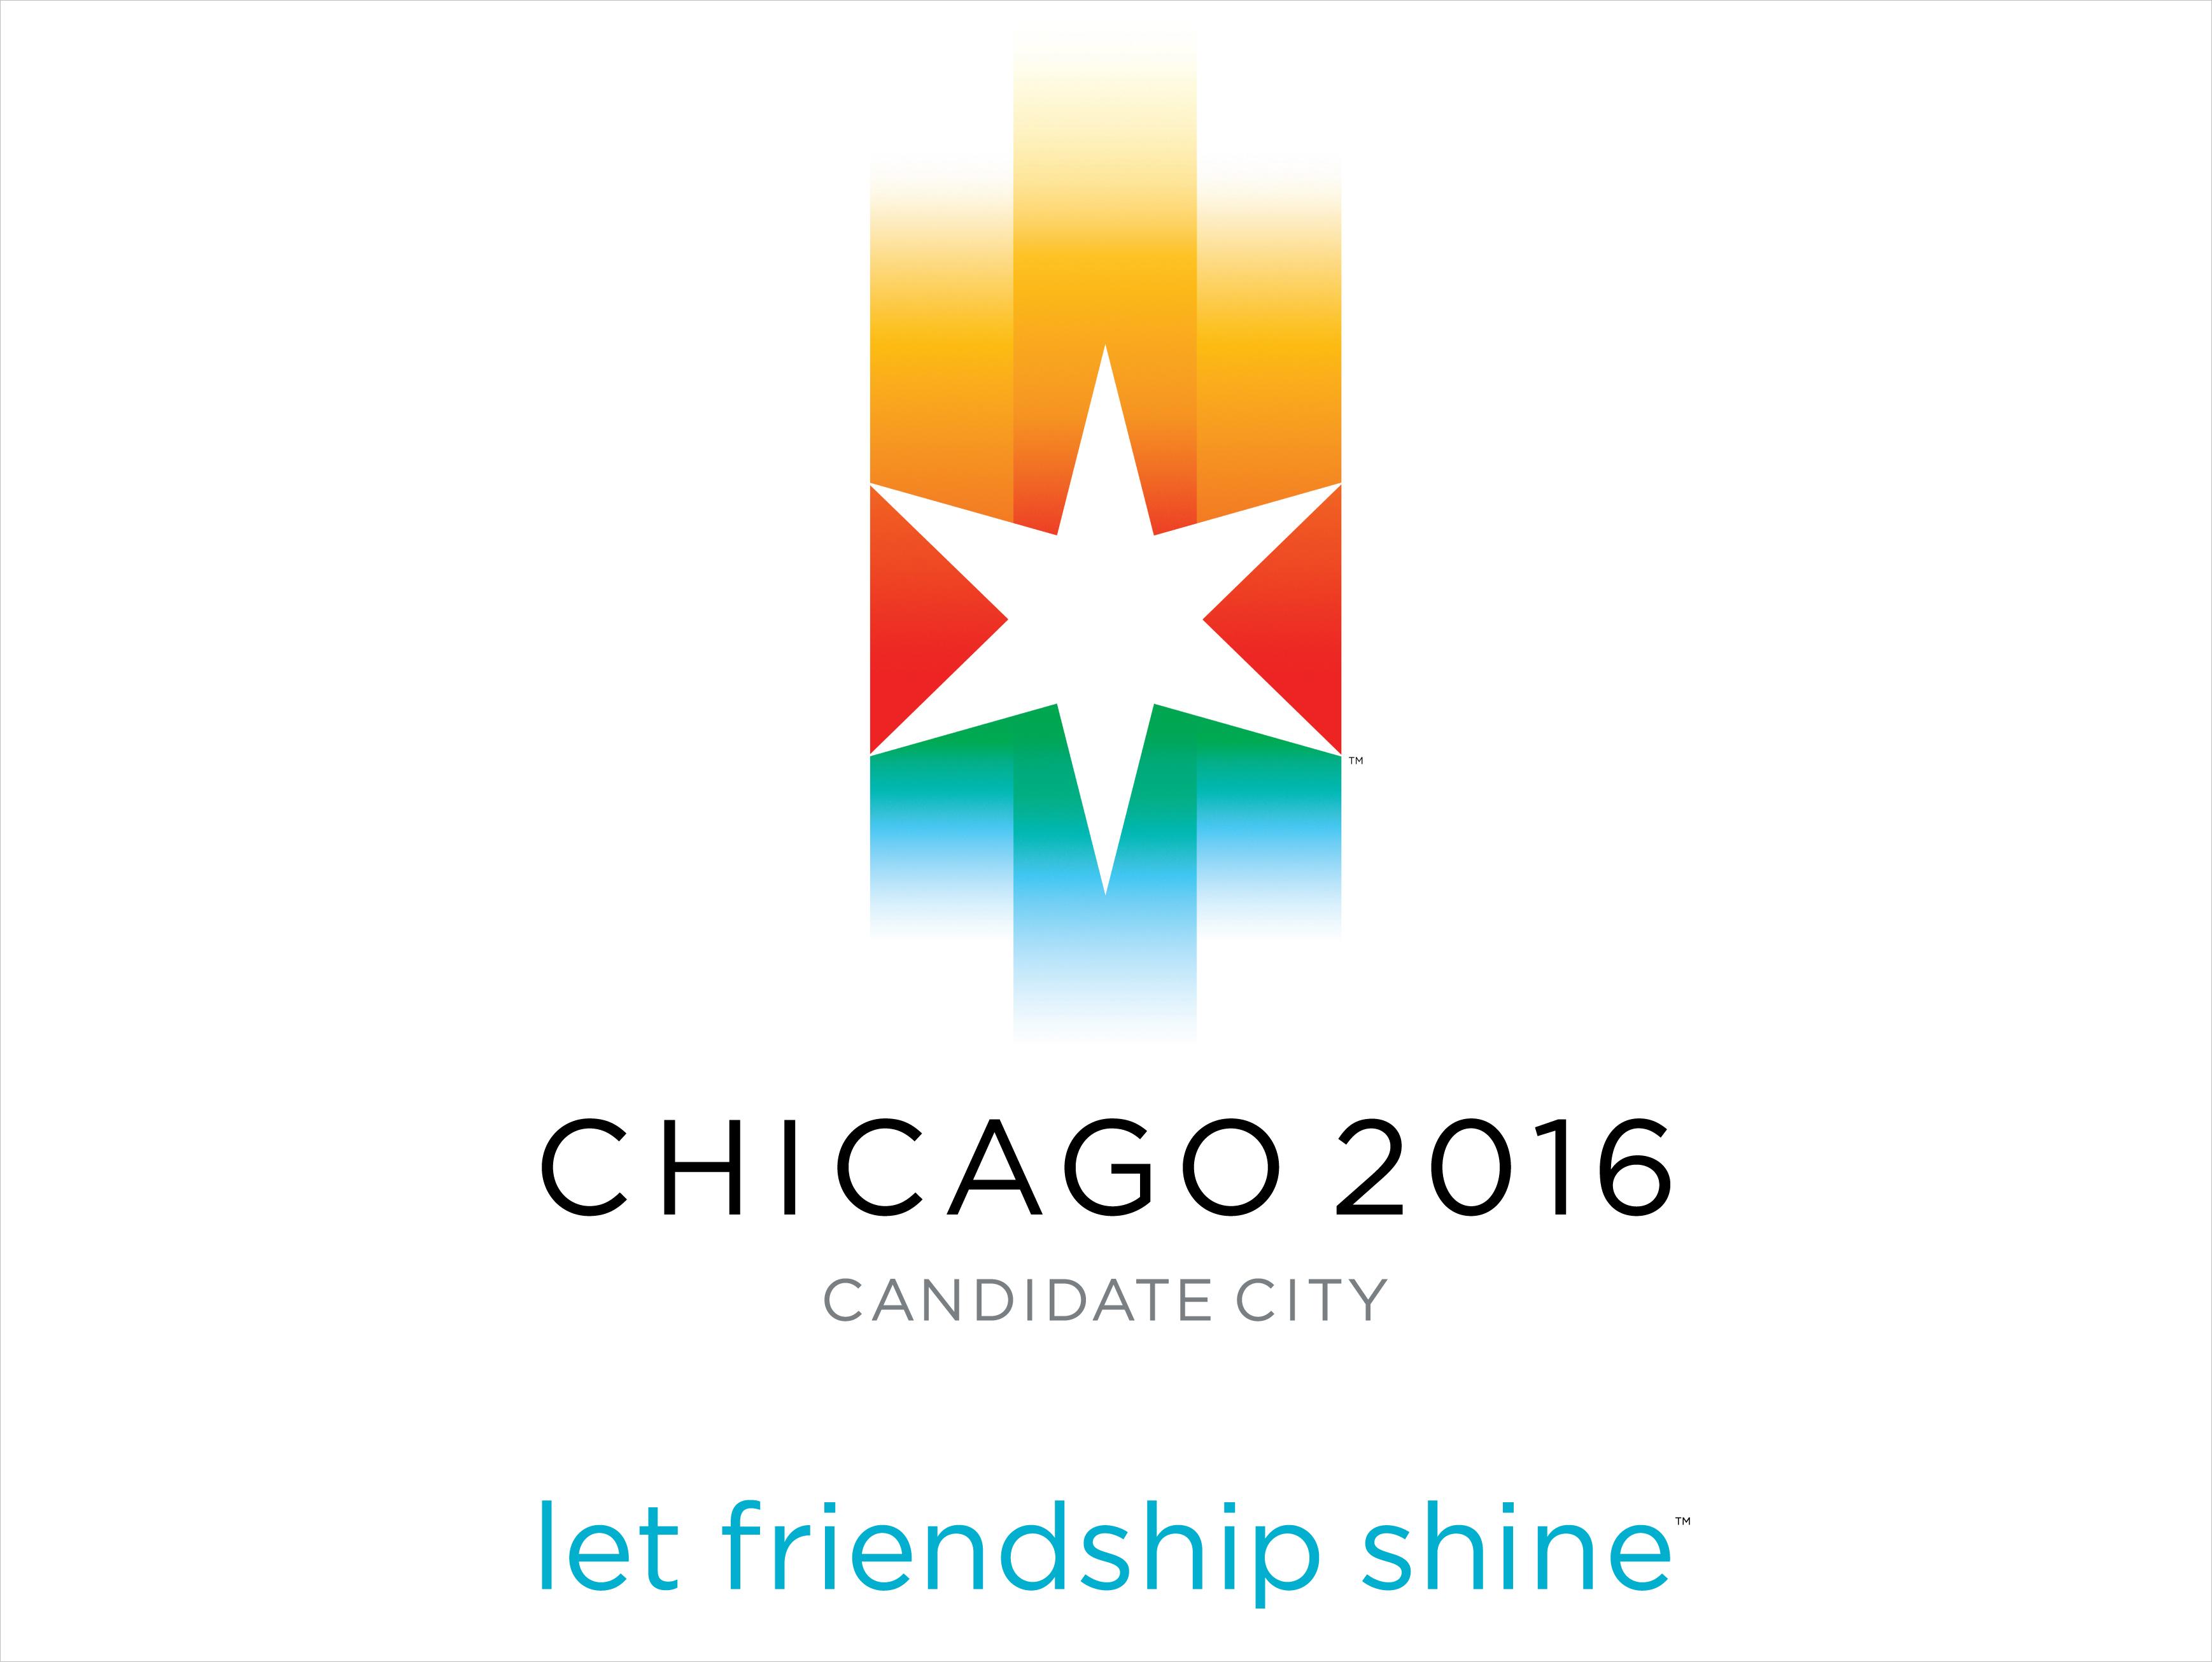 Chicago Olympics 2016